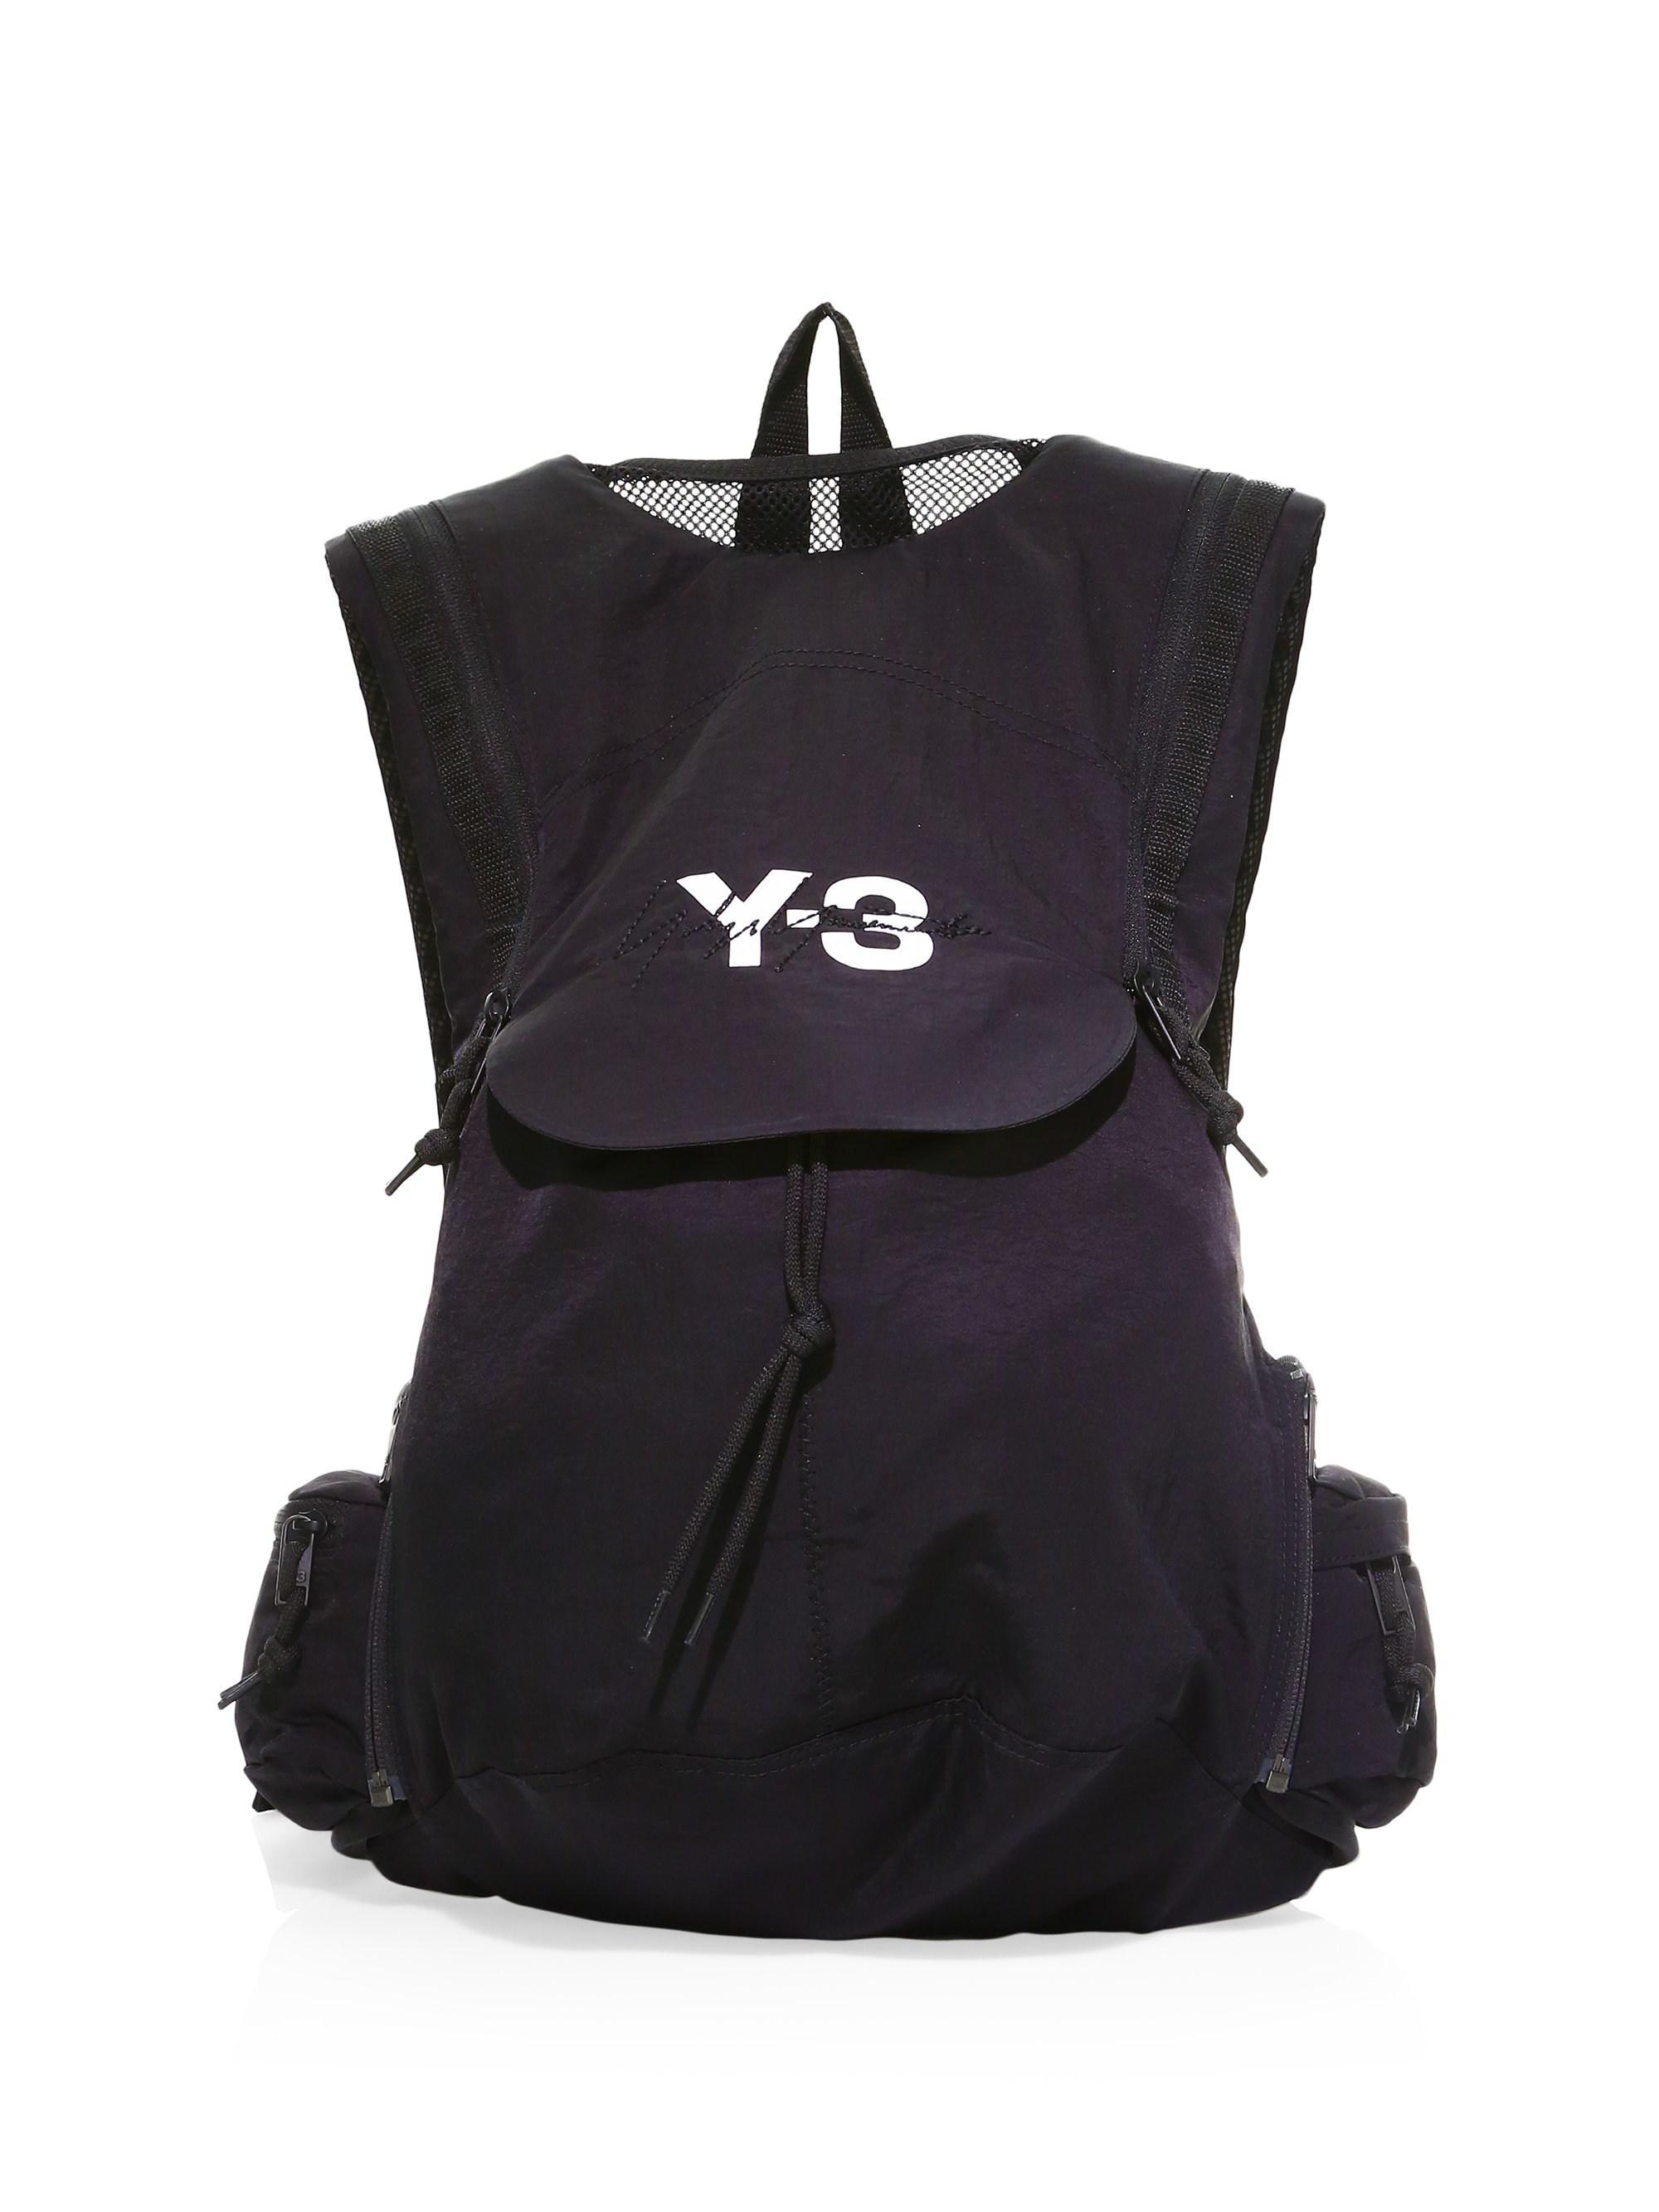 Lyst - Y-3 Running Backpack in Black for Men d082902646a70